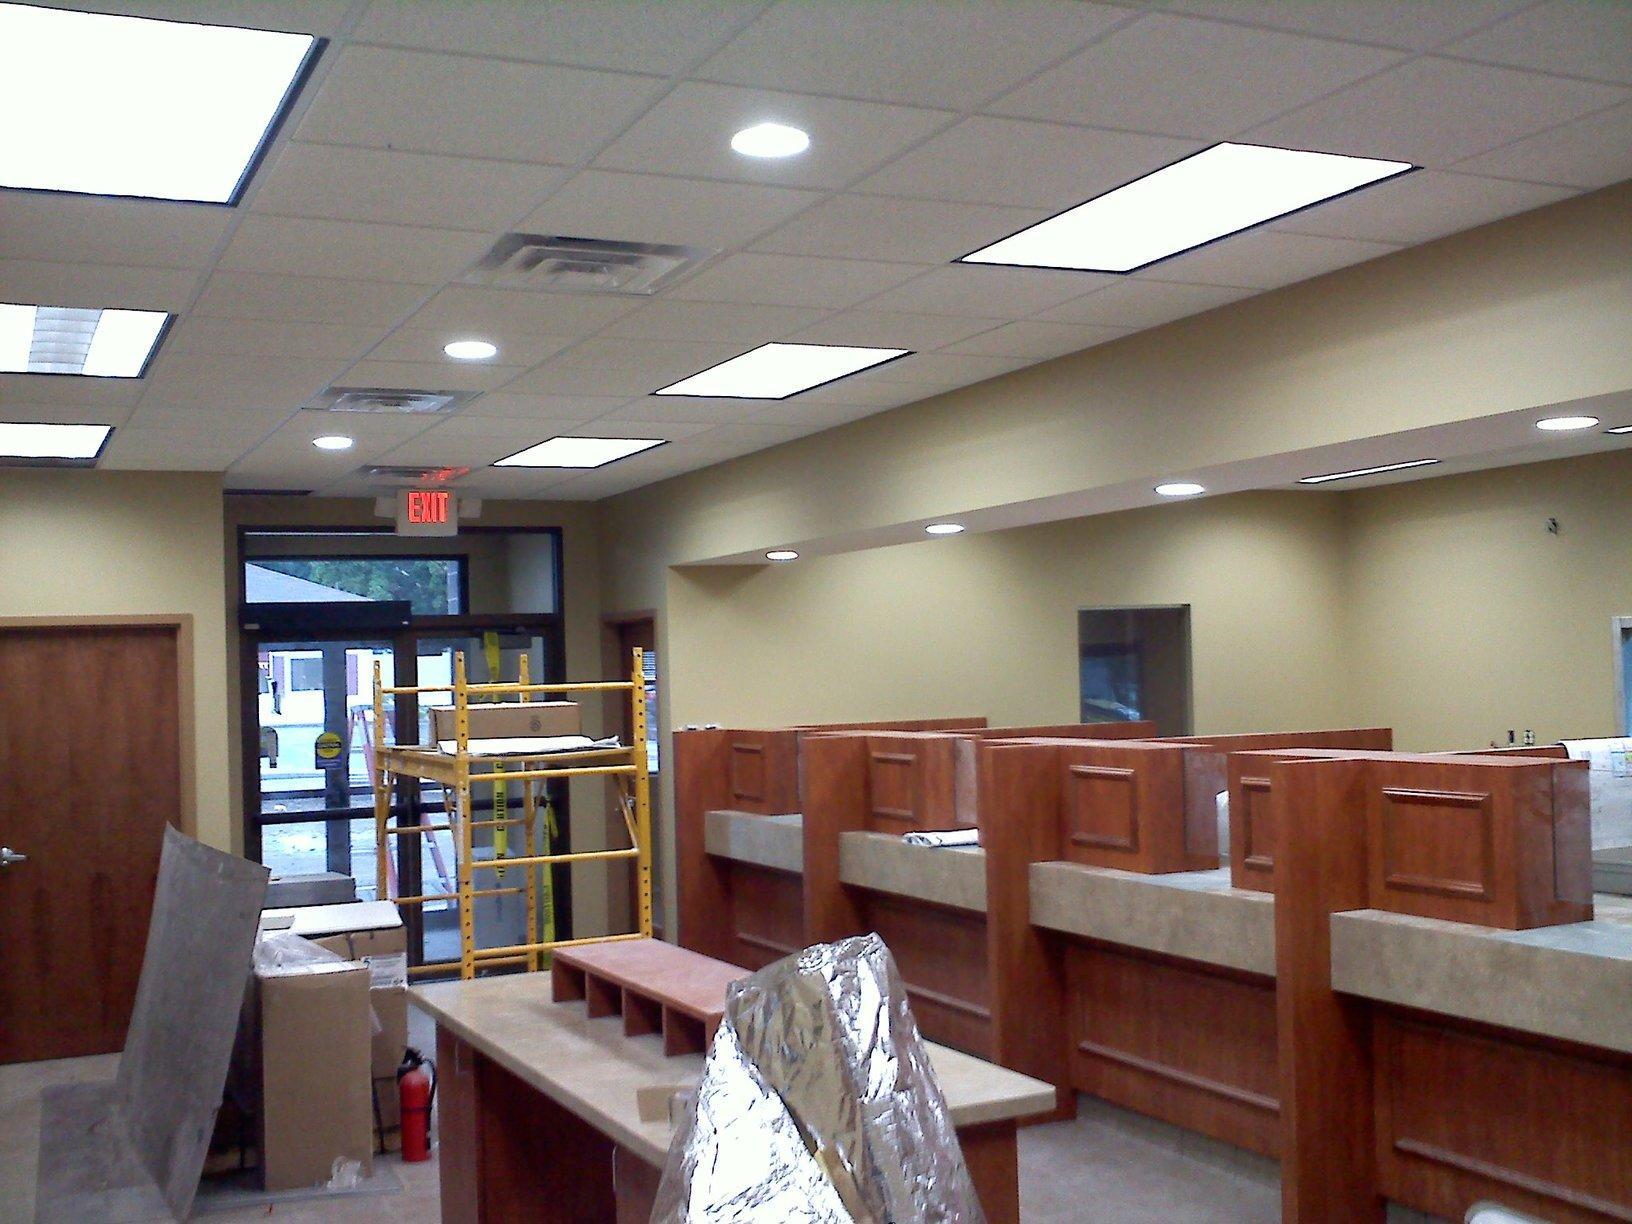 Electric installation at Community Bank in Palmyra, NY